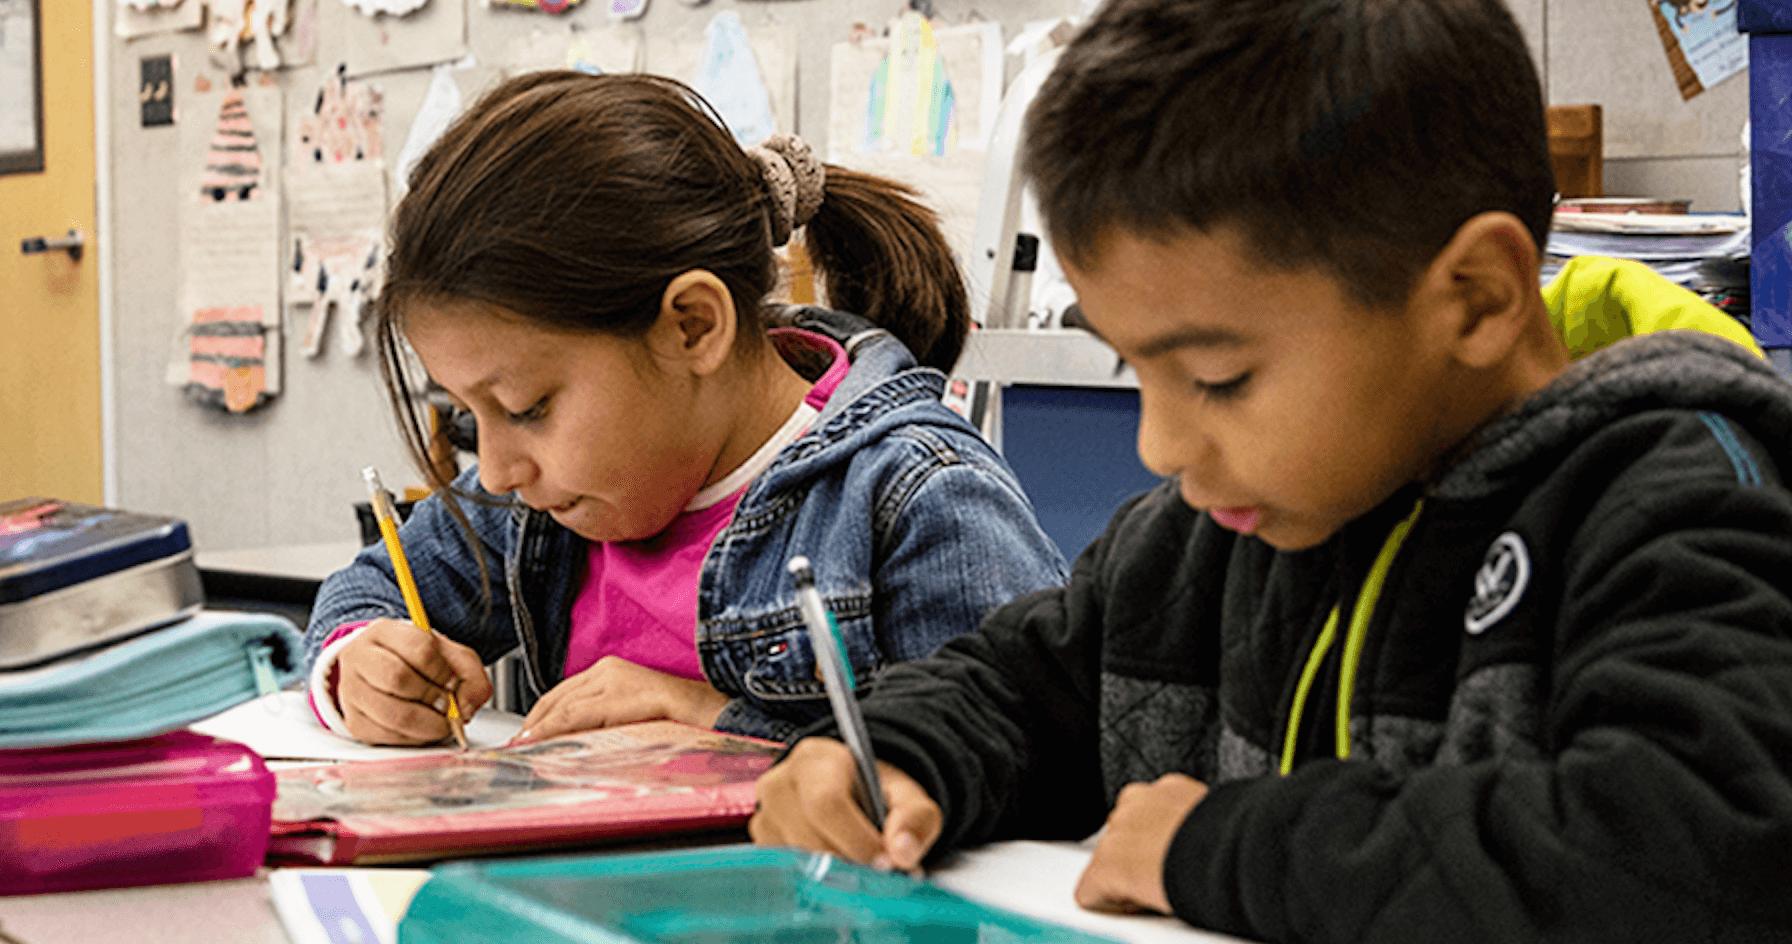 Students writing at desk